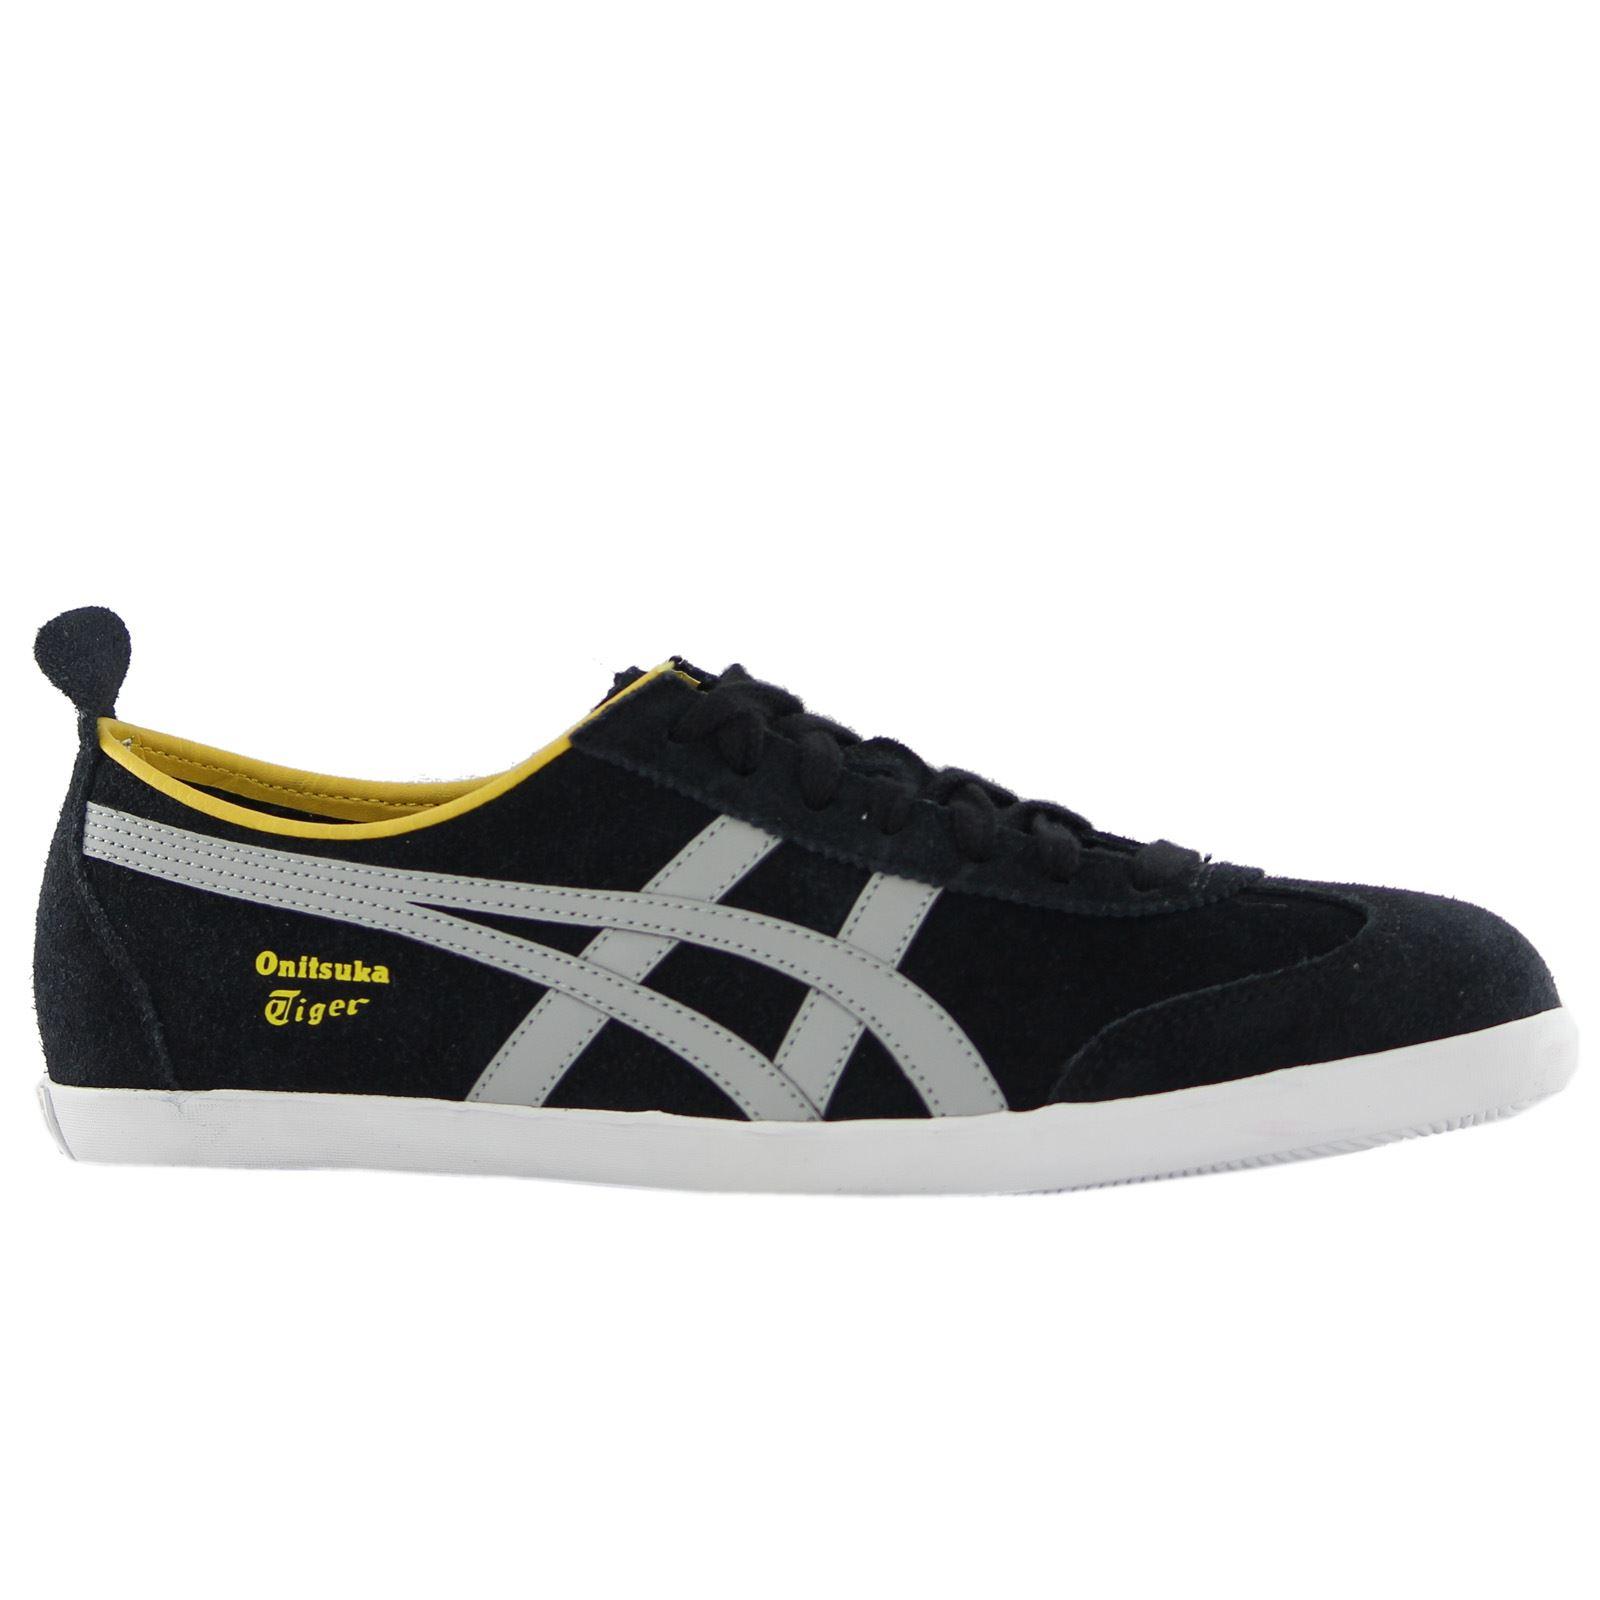 size 40 53ead ee04b asics onitsuka tiger mexico 66 vulc cv sneaker